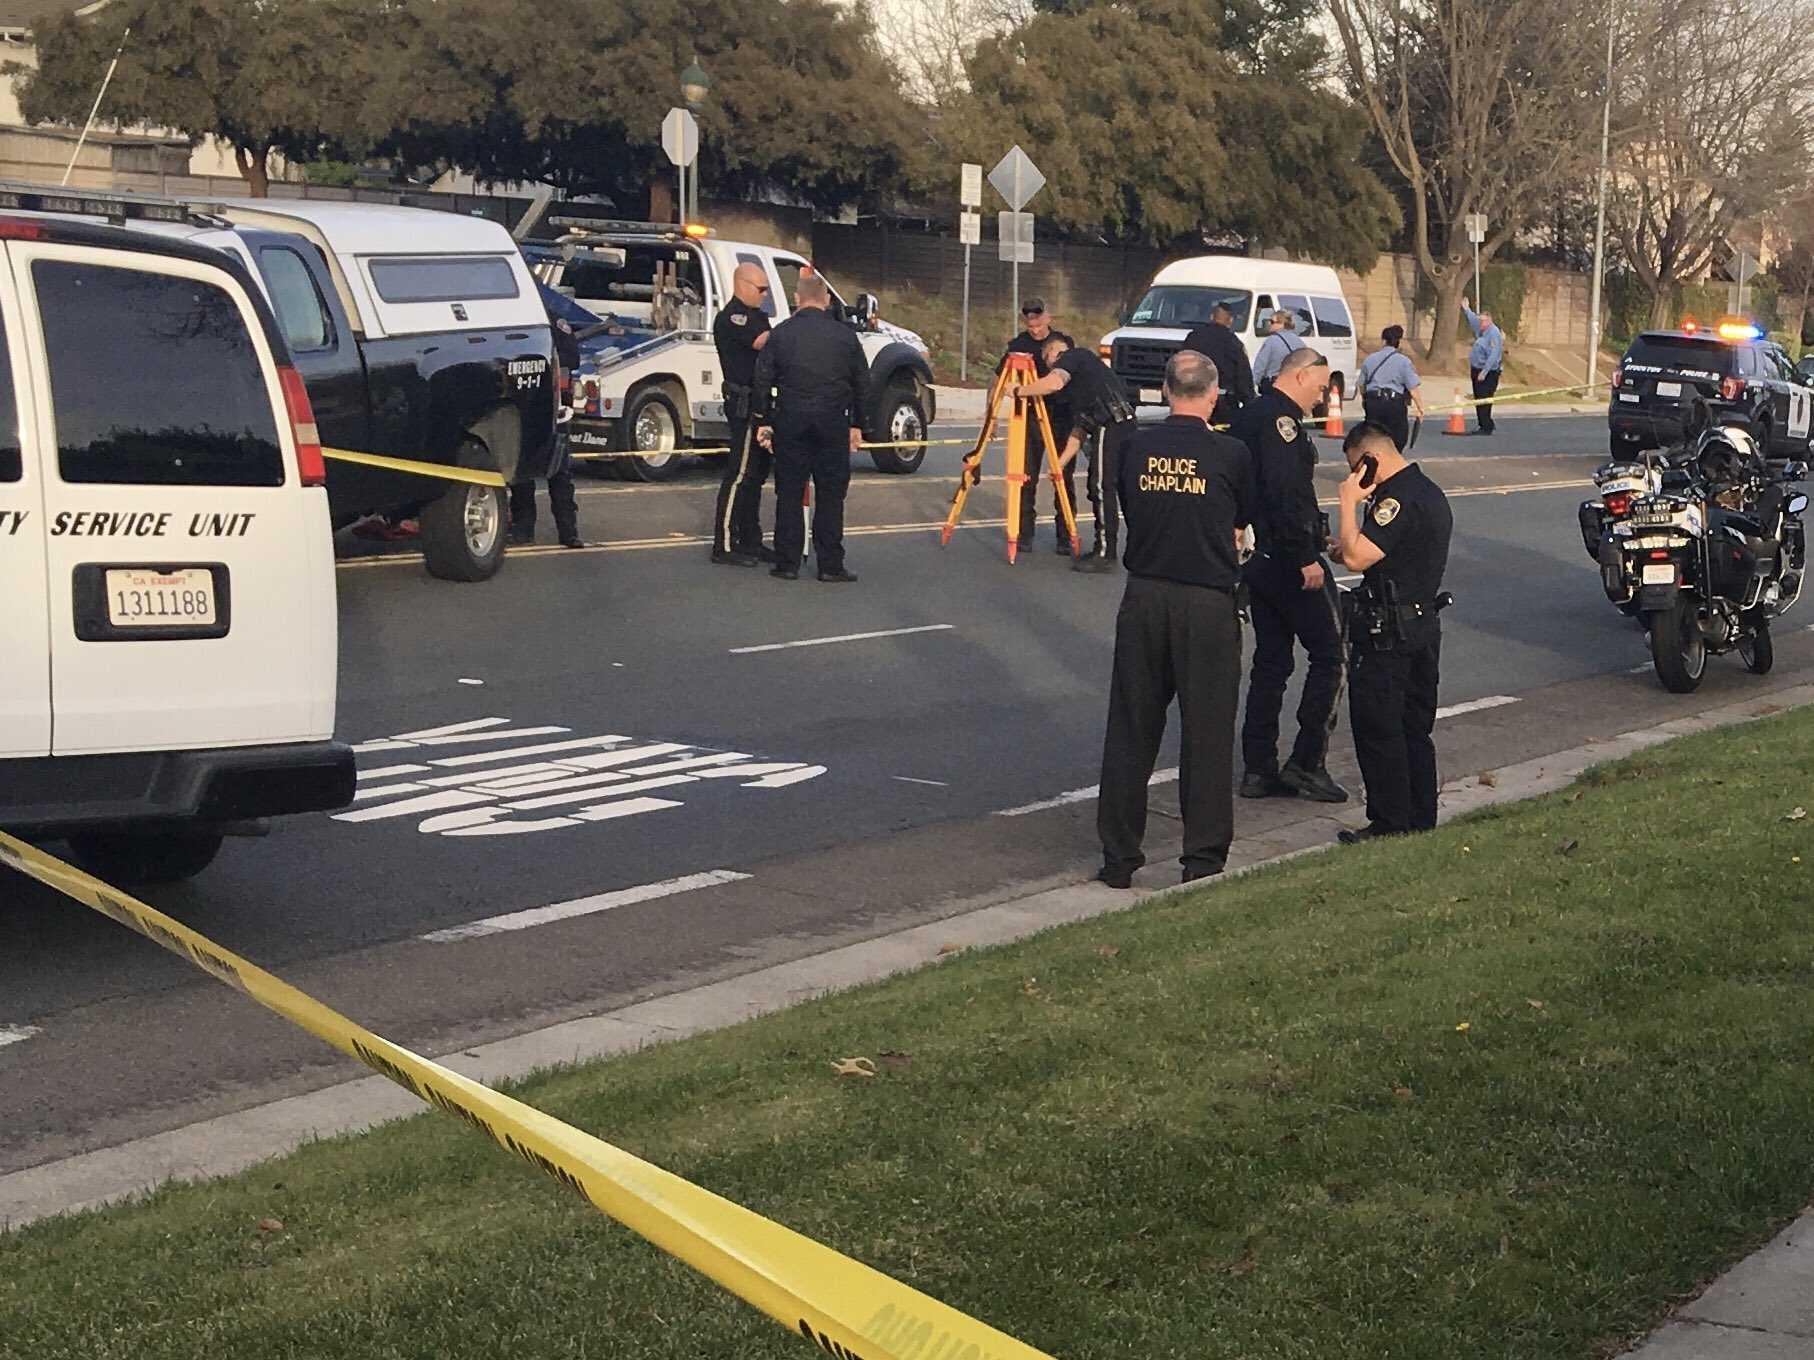 9-year-old girl hit by car in Stockton crash - Modesto news - NewsLocker